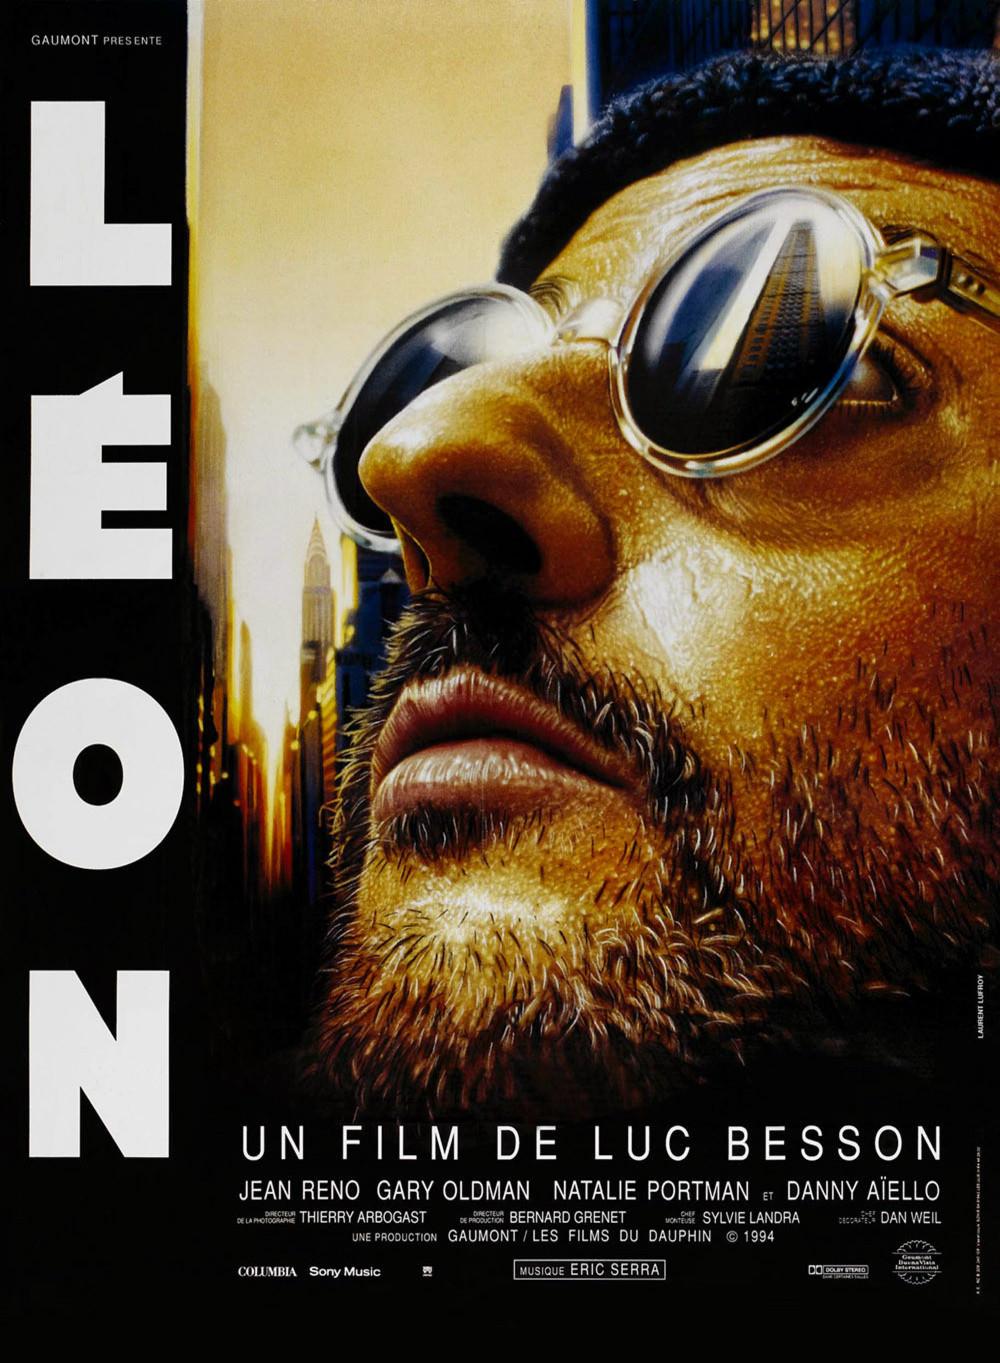 Leon besson